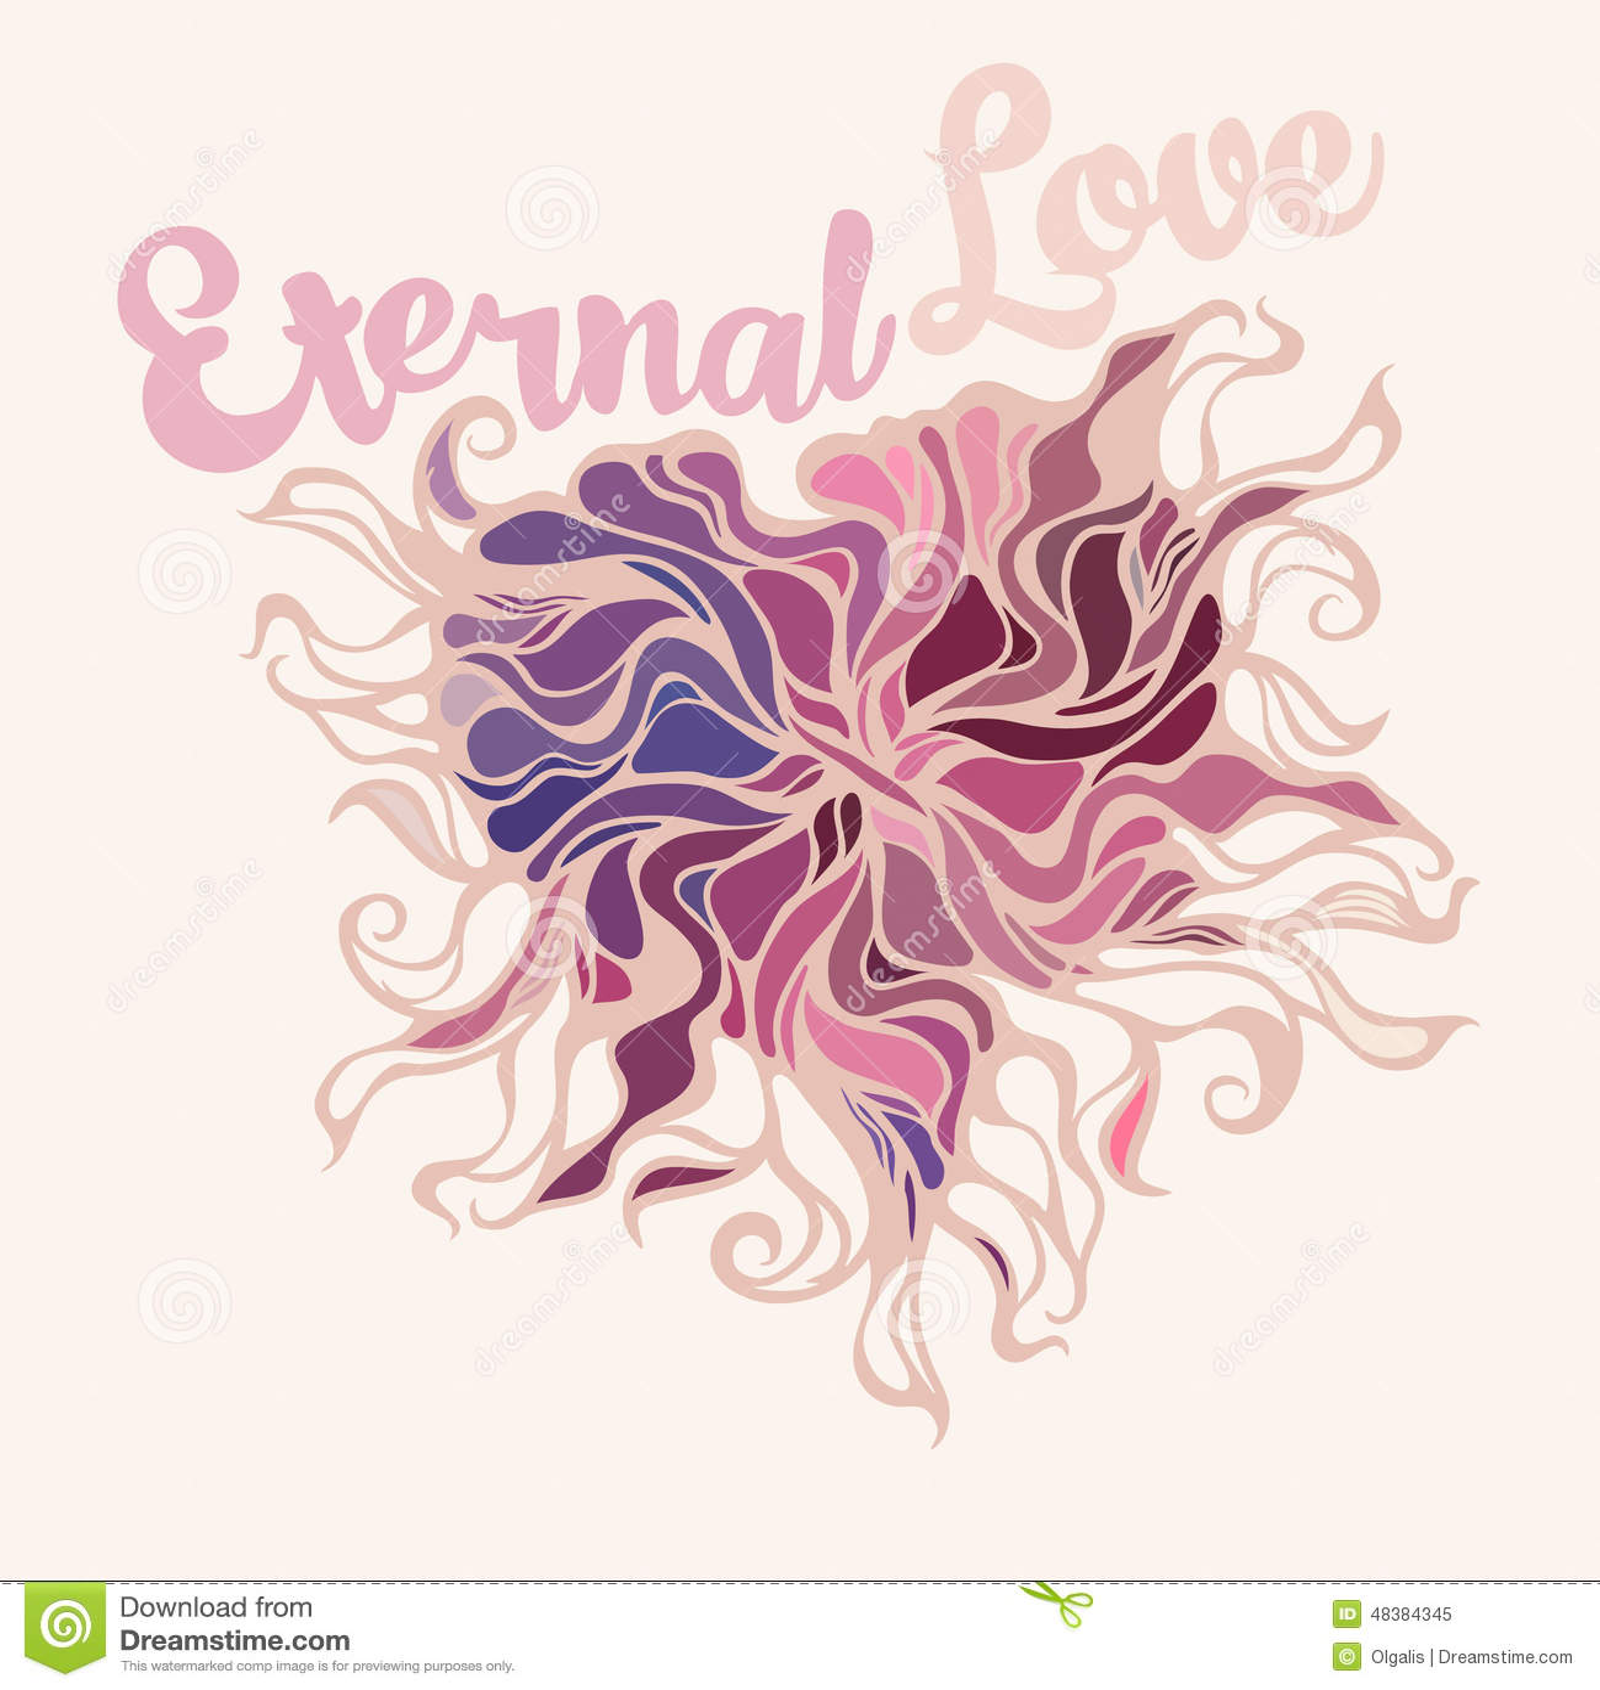 Heart Symbol Of Eternal Love Stock Vector Illustration Of Abstract